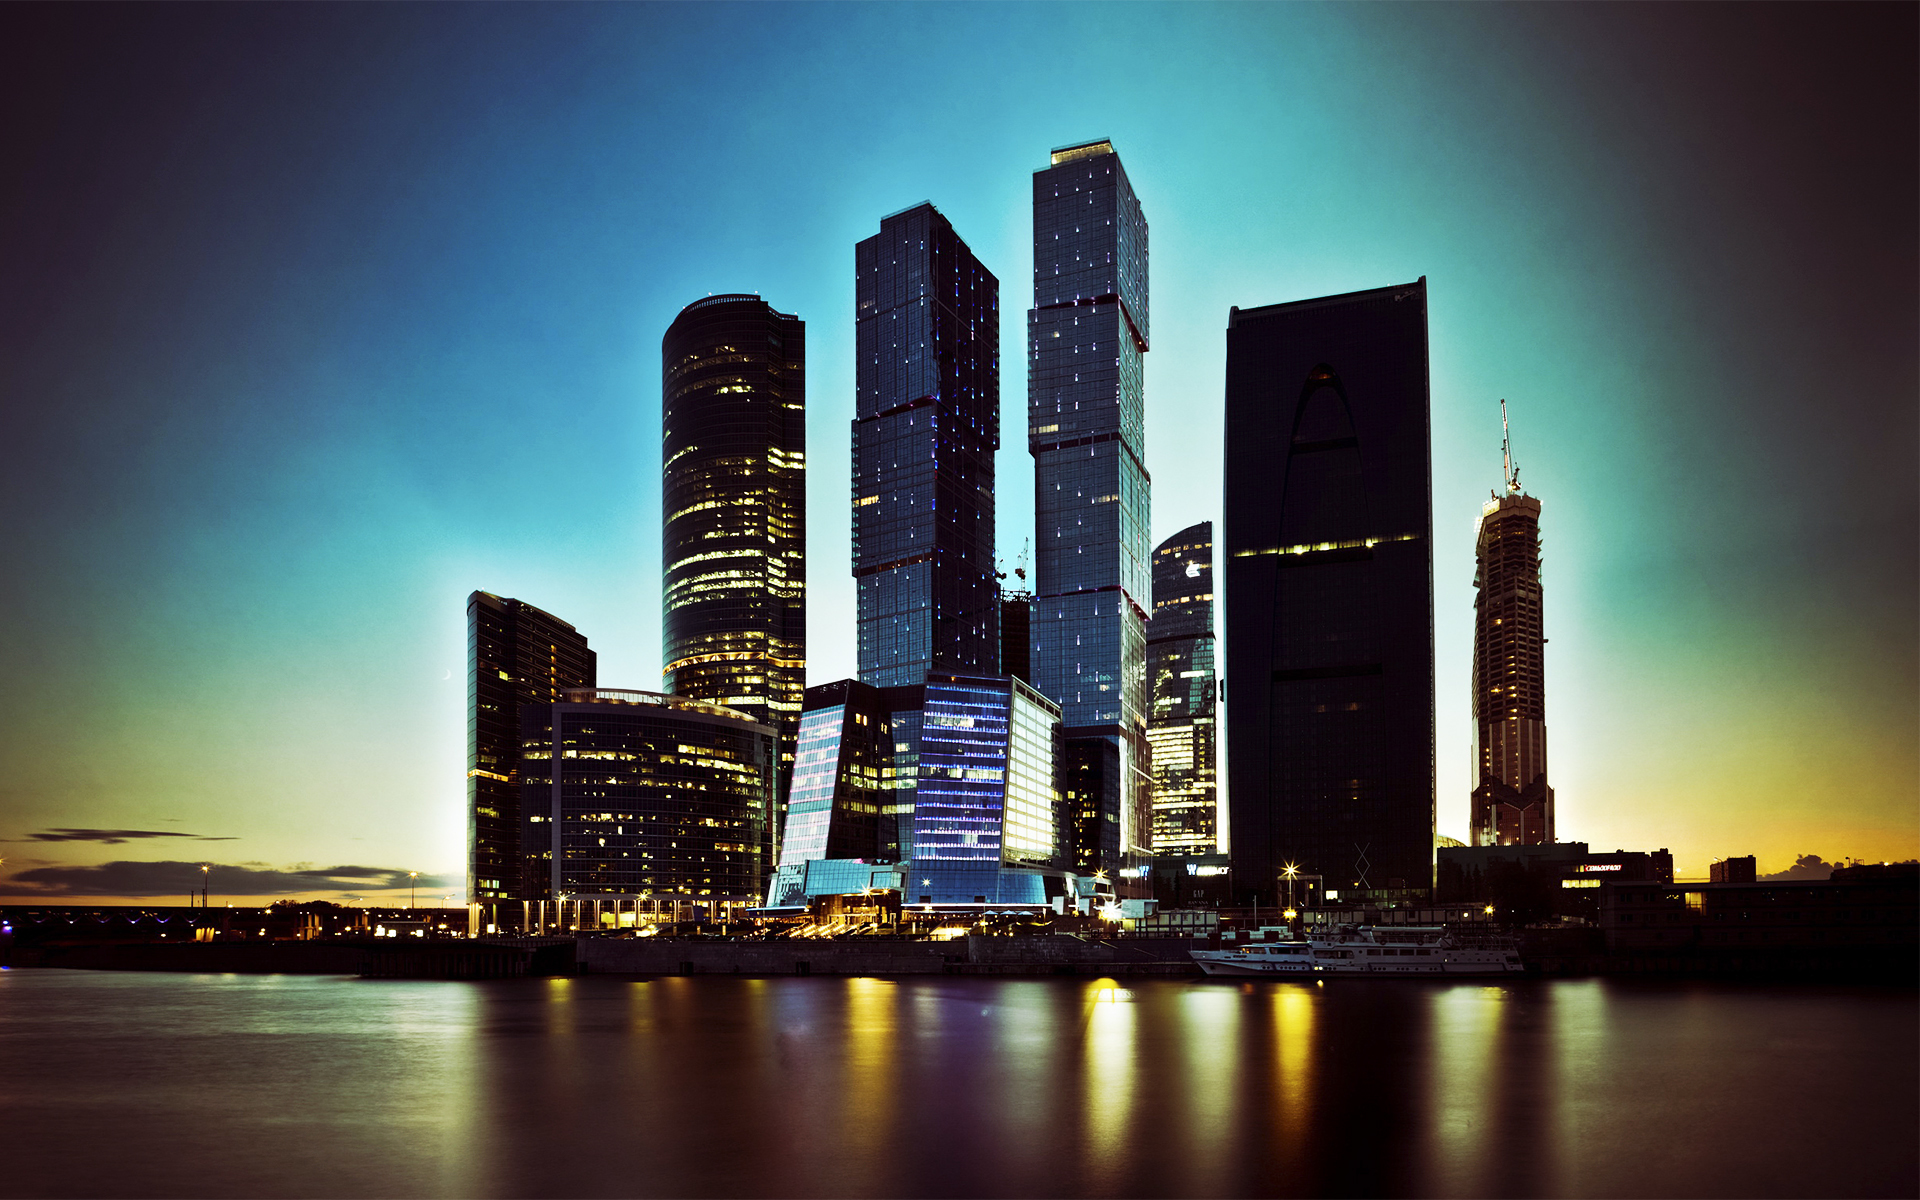 картинки на тему небоскребы